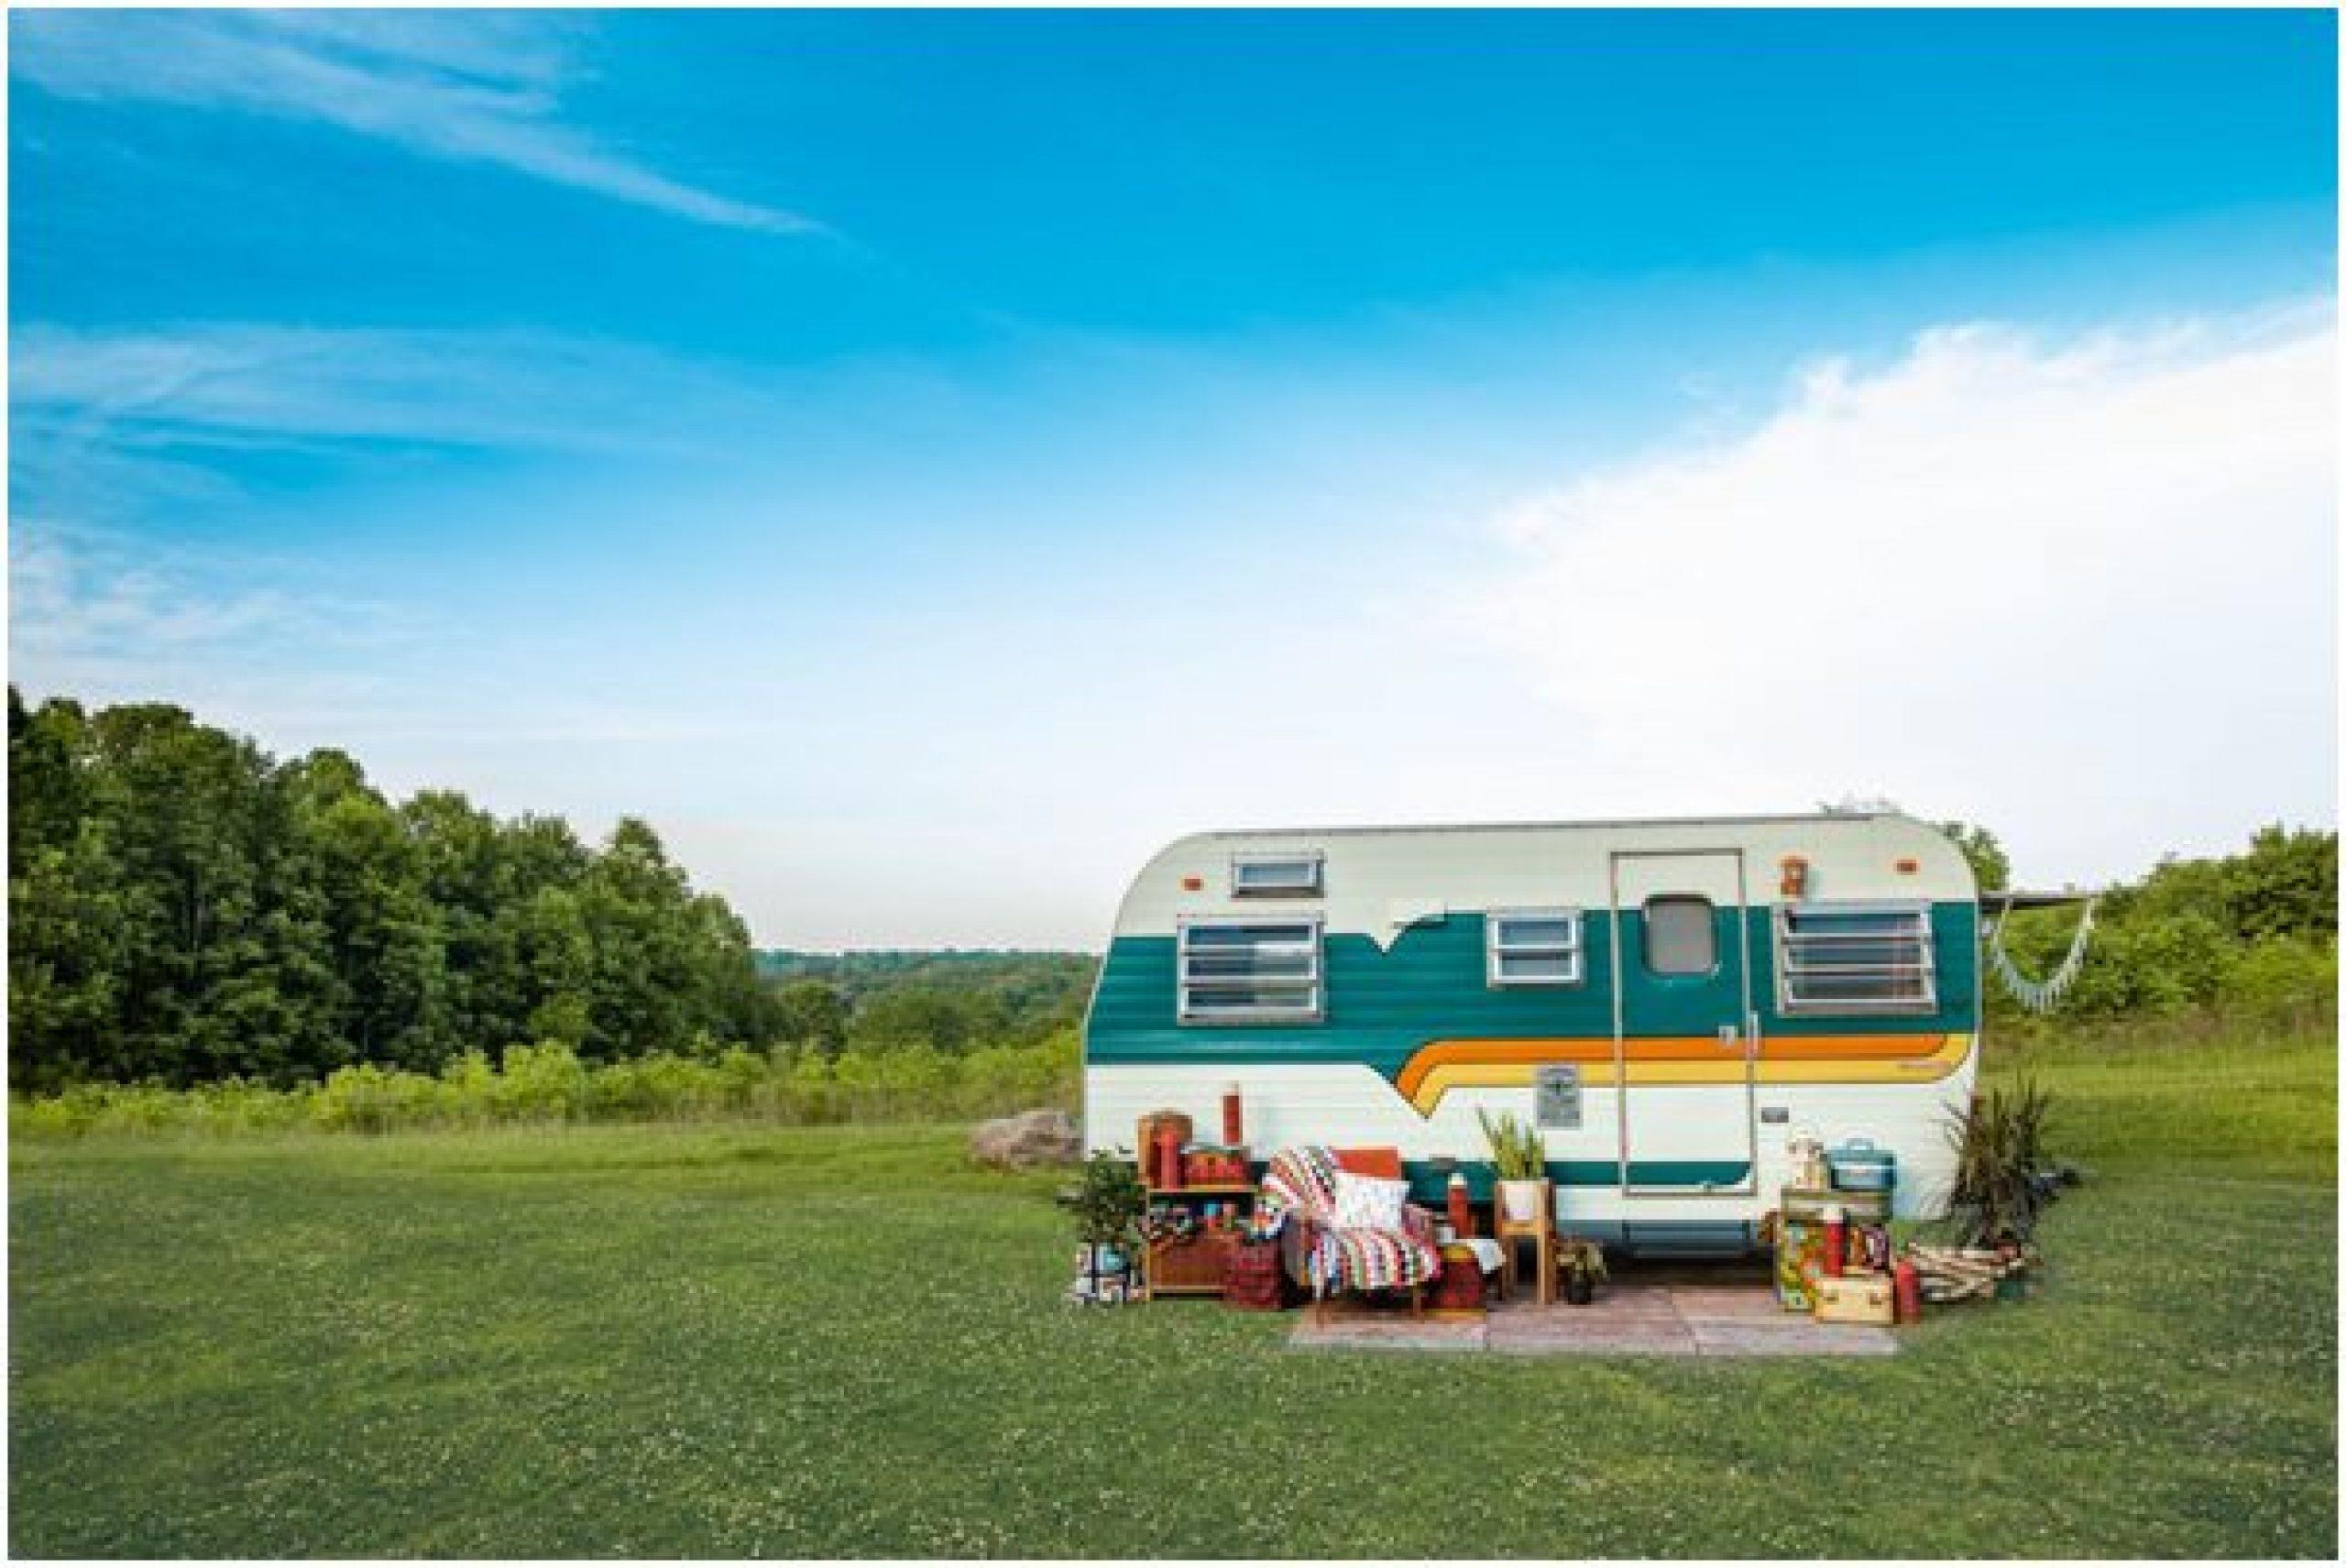 campervan in a field